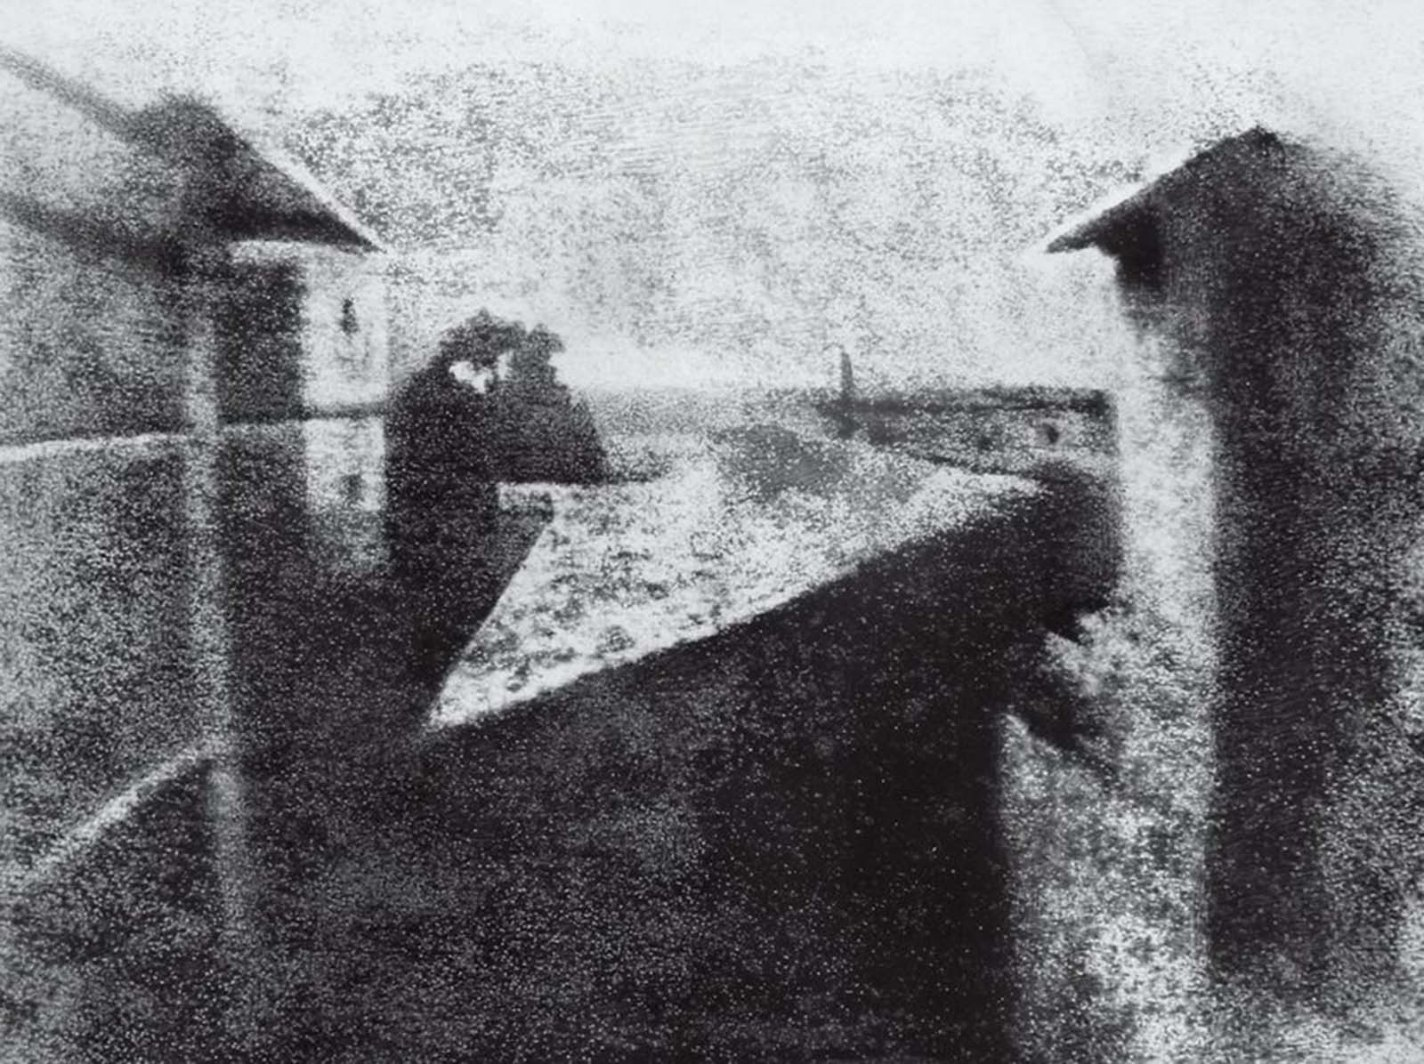 historical photos: Le Gras, Joseph Nicéphore Niépce, 1826.